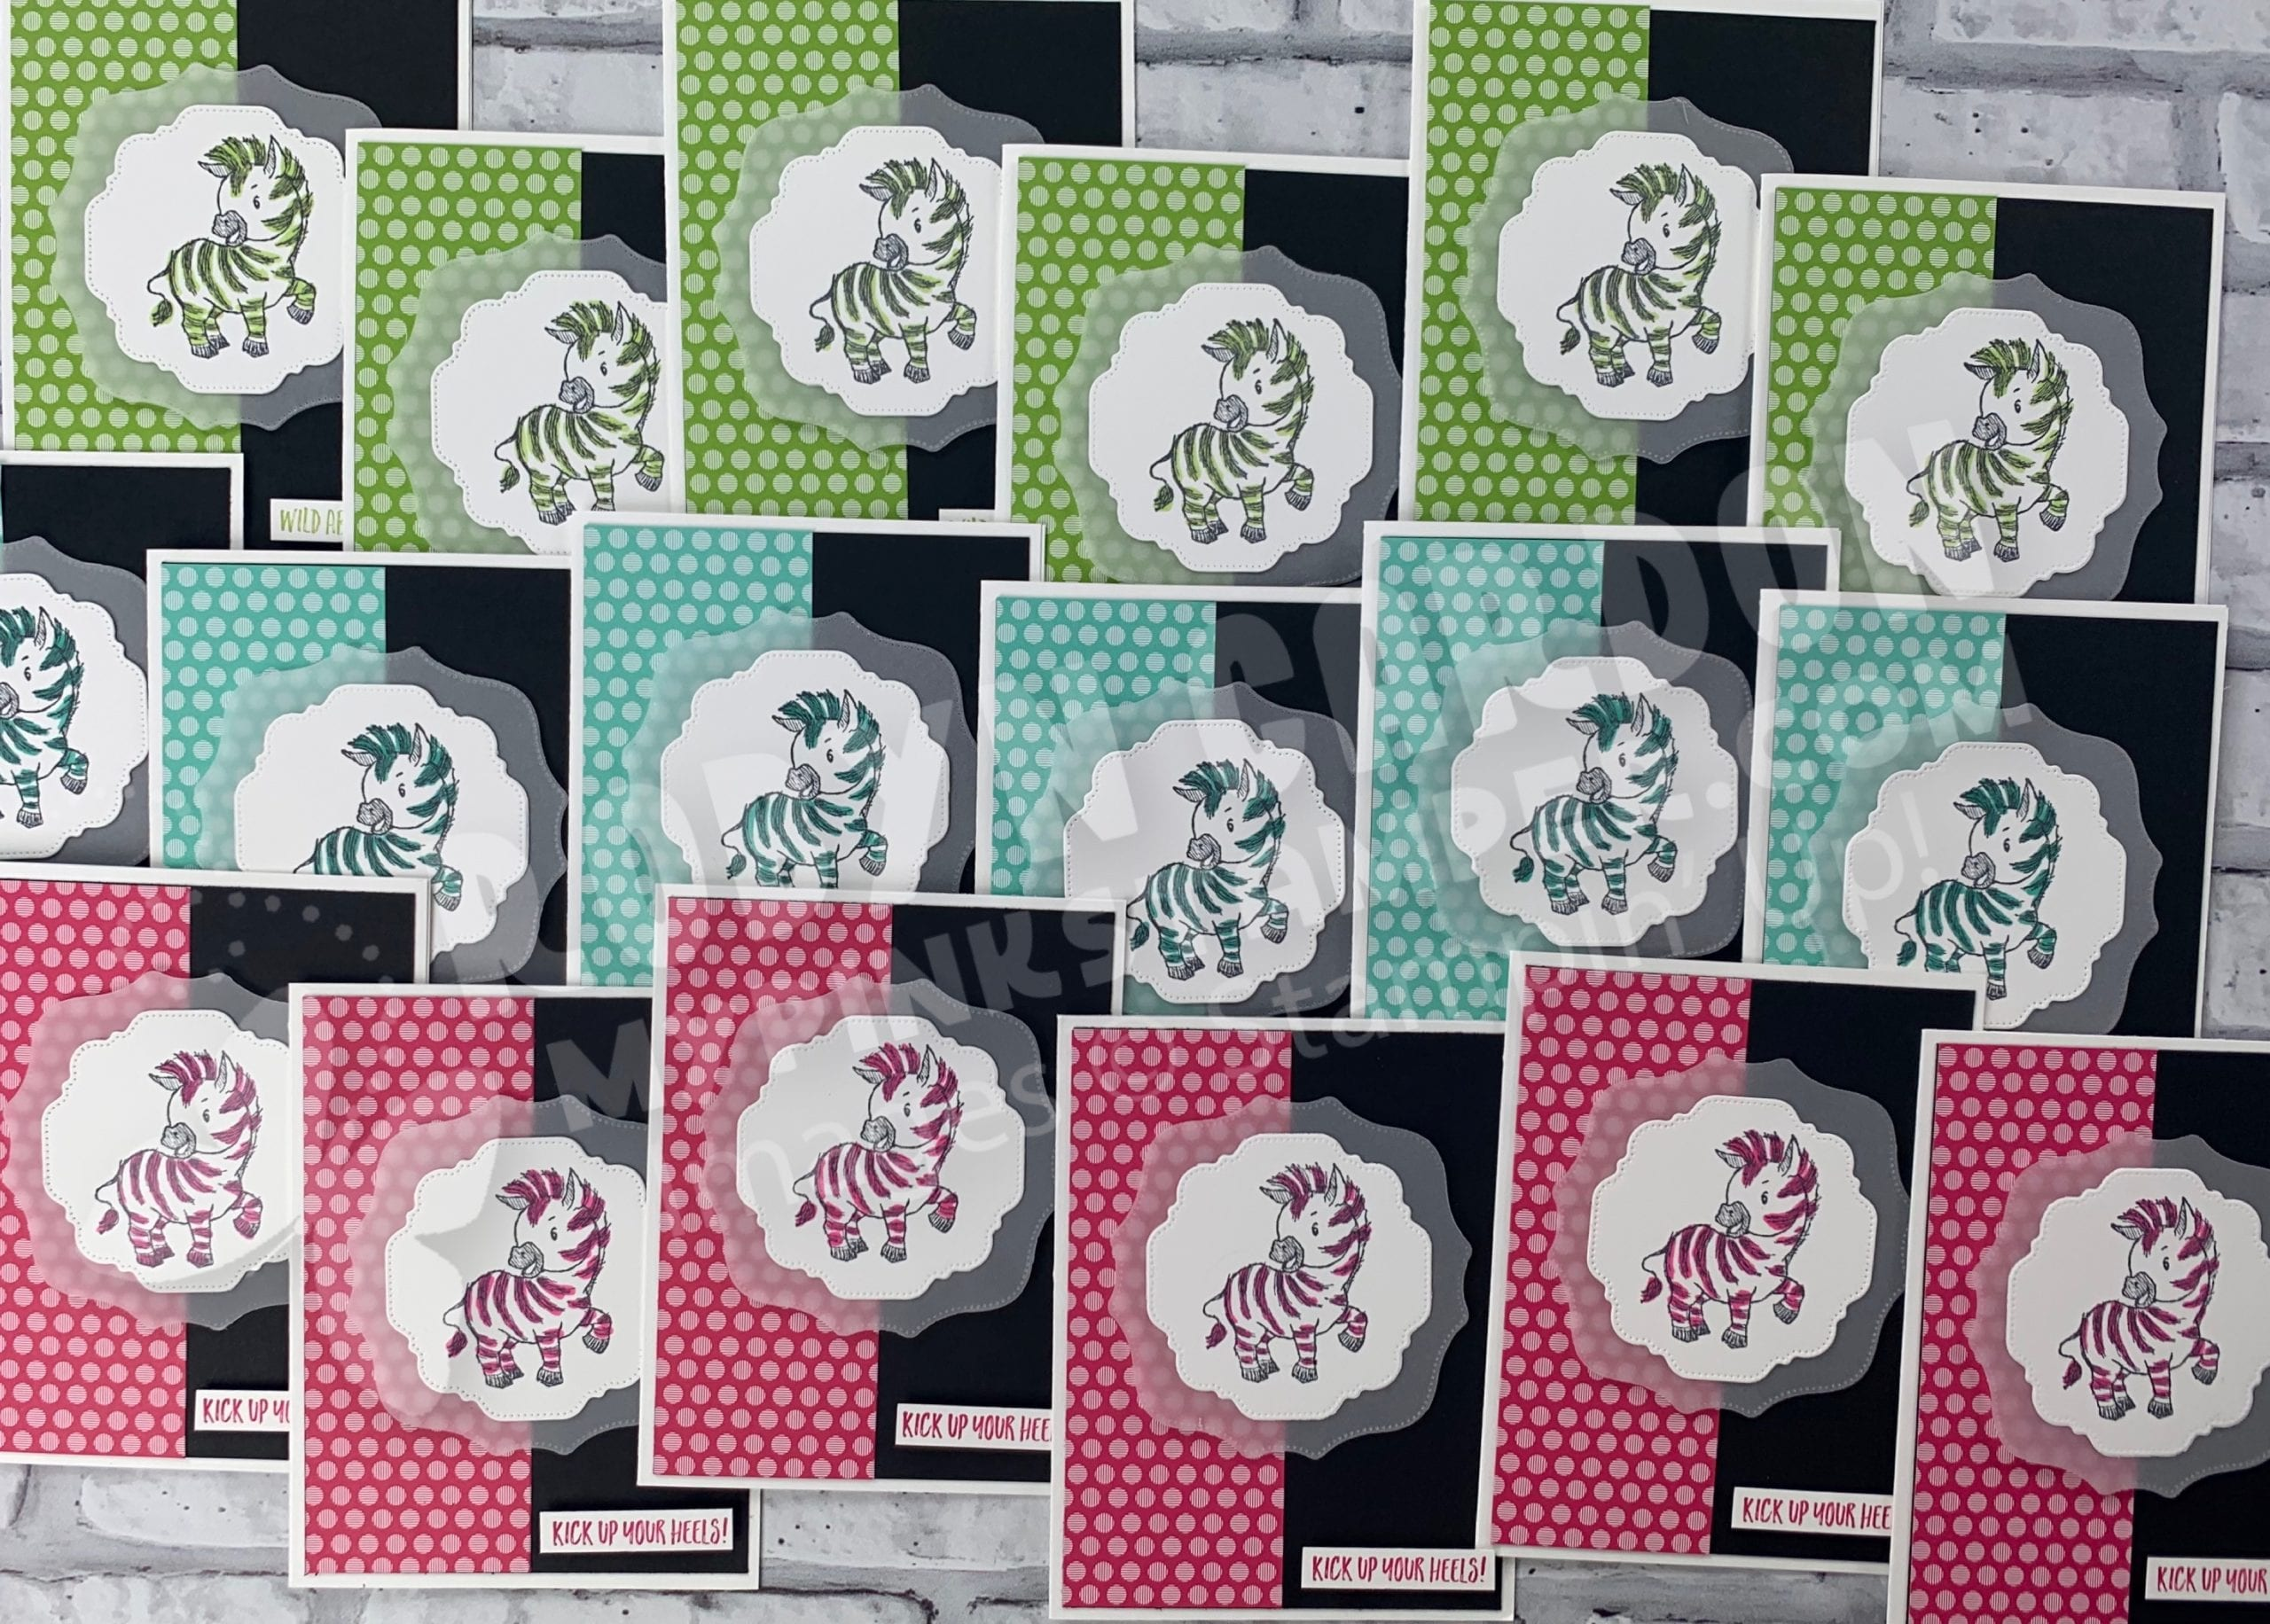 {VIDEO}Episode 783 – Stampin' Up! Zany Zebras Stamp Set & Super Fun Card